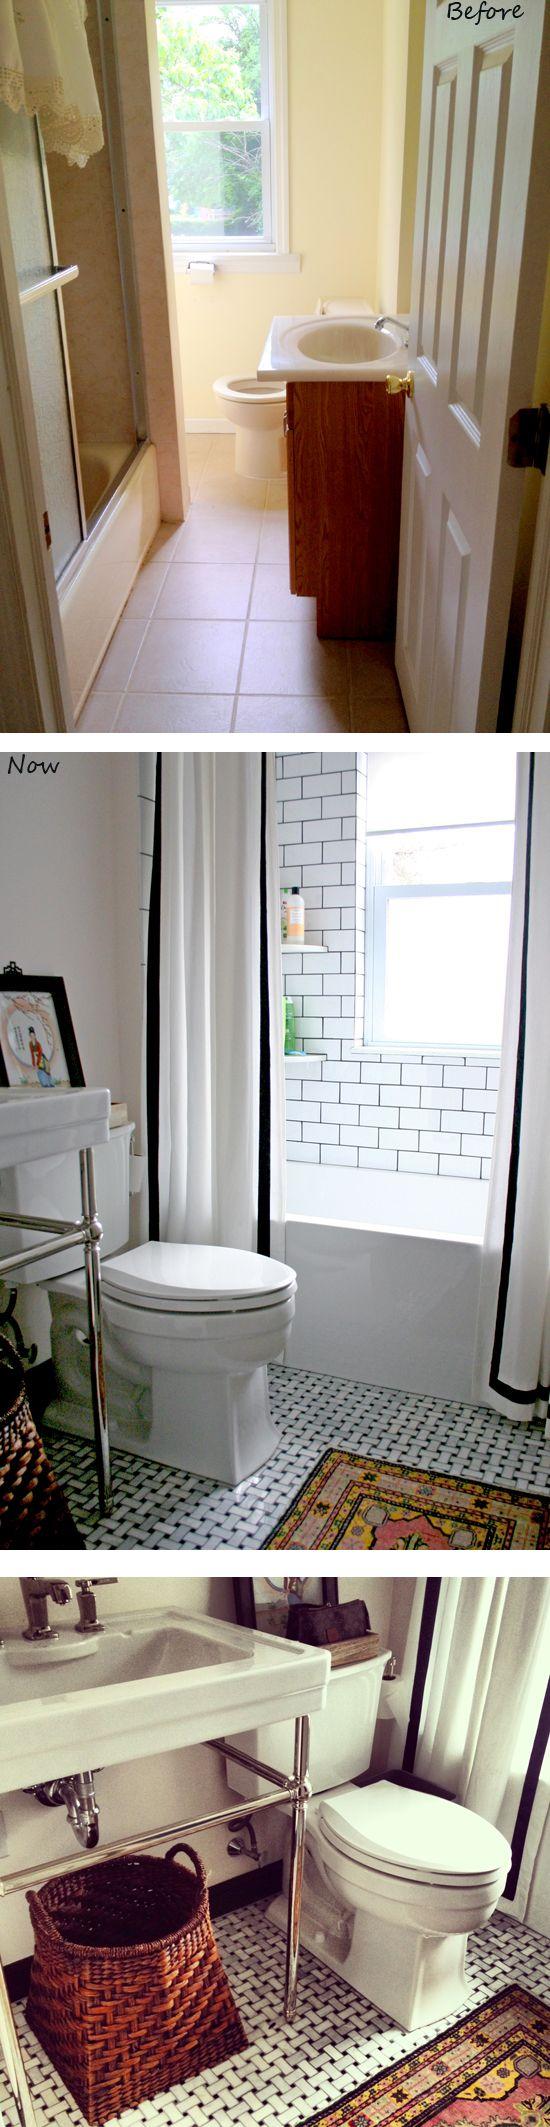 design manifest bathroom before and after